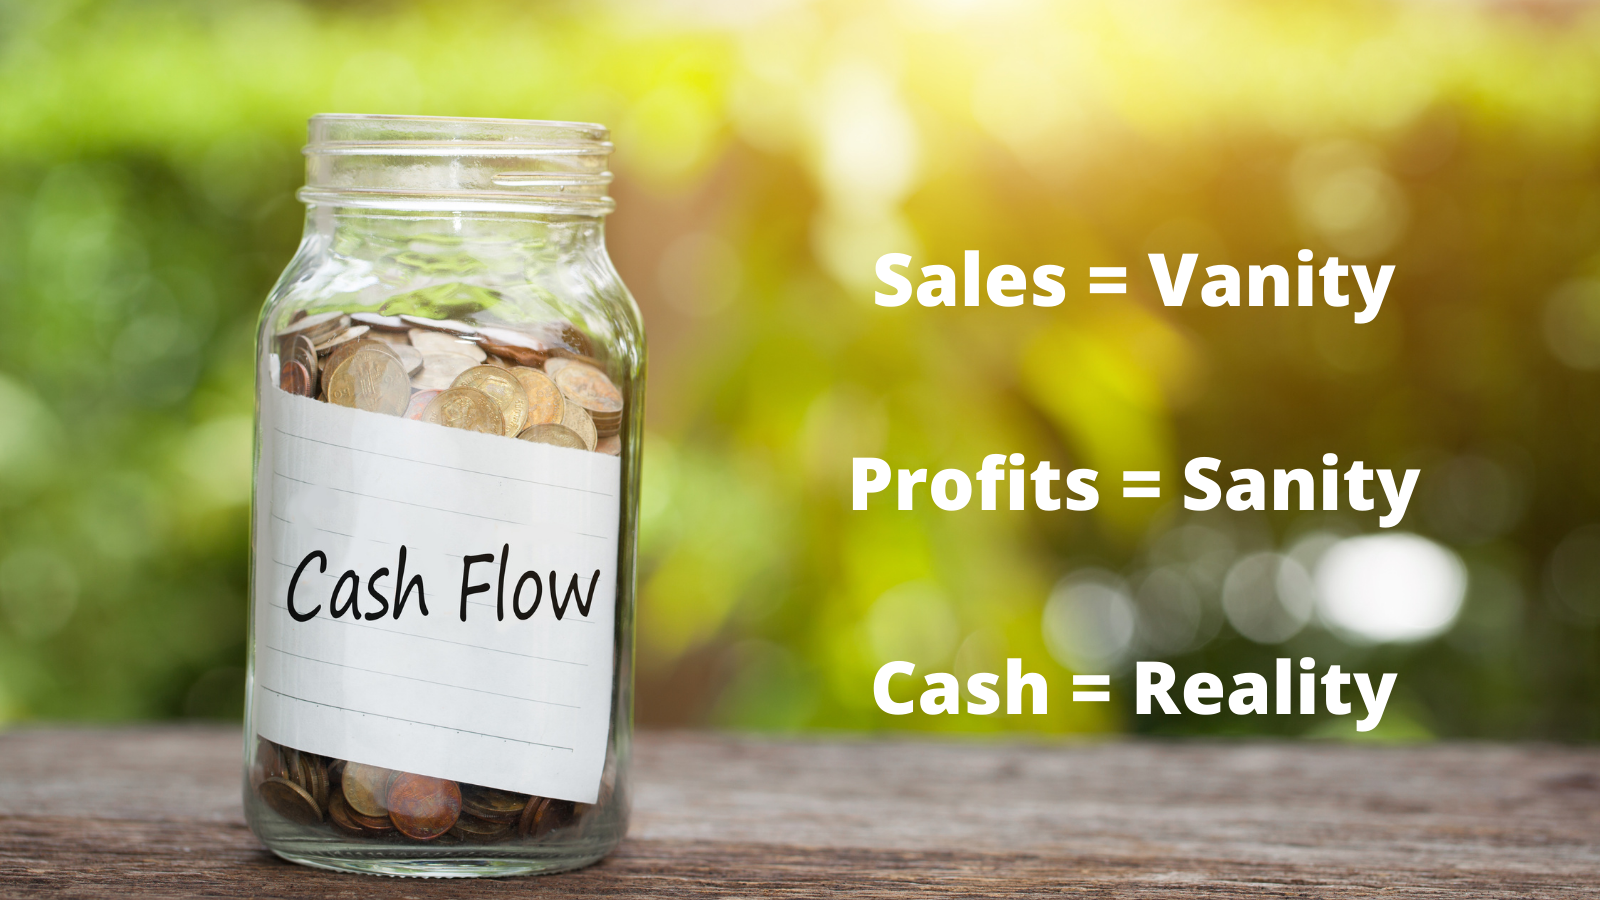 Is Lack of Cash Flow Harming Your Business?